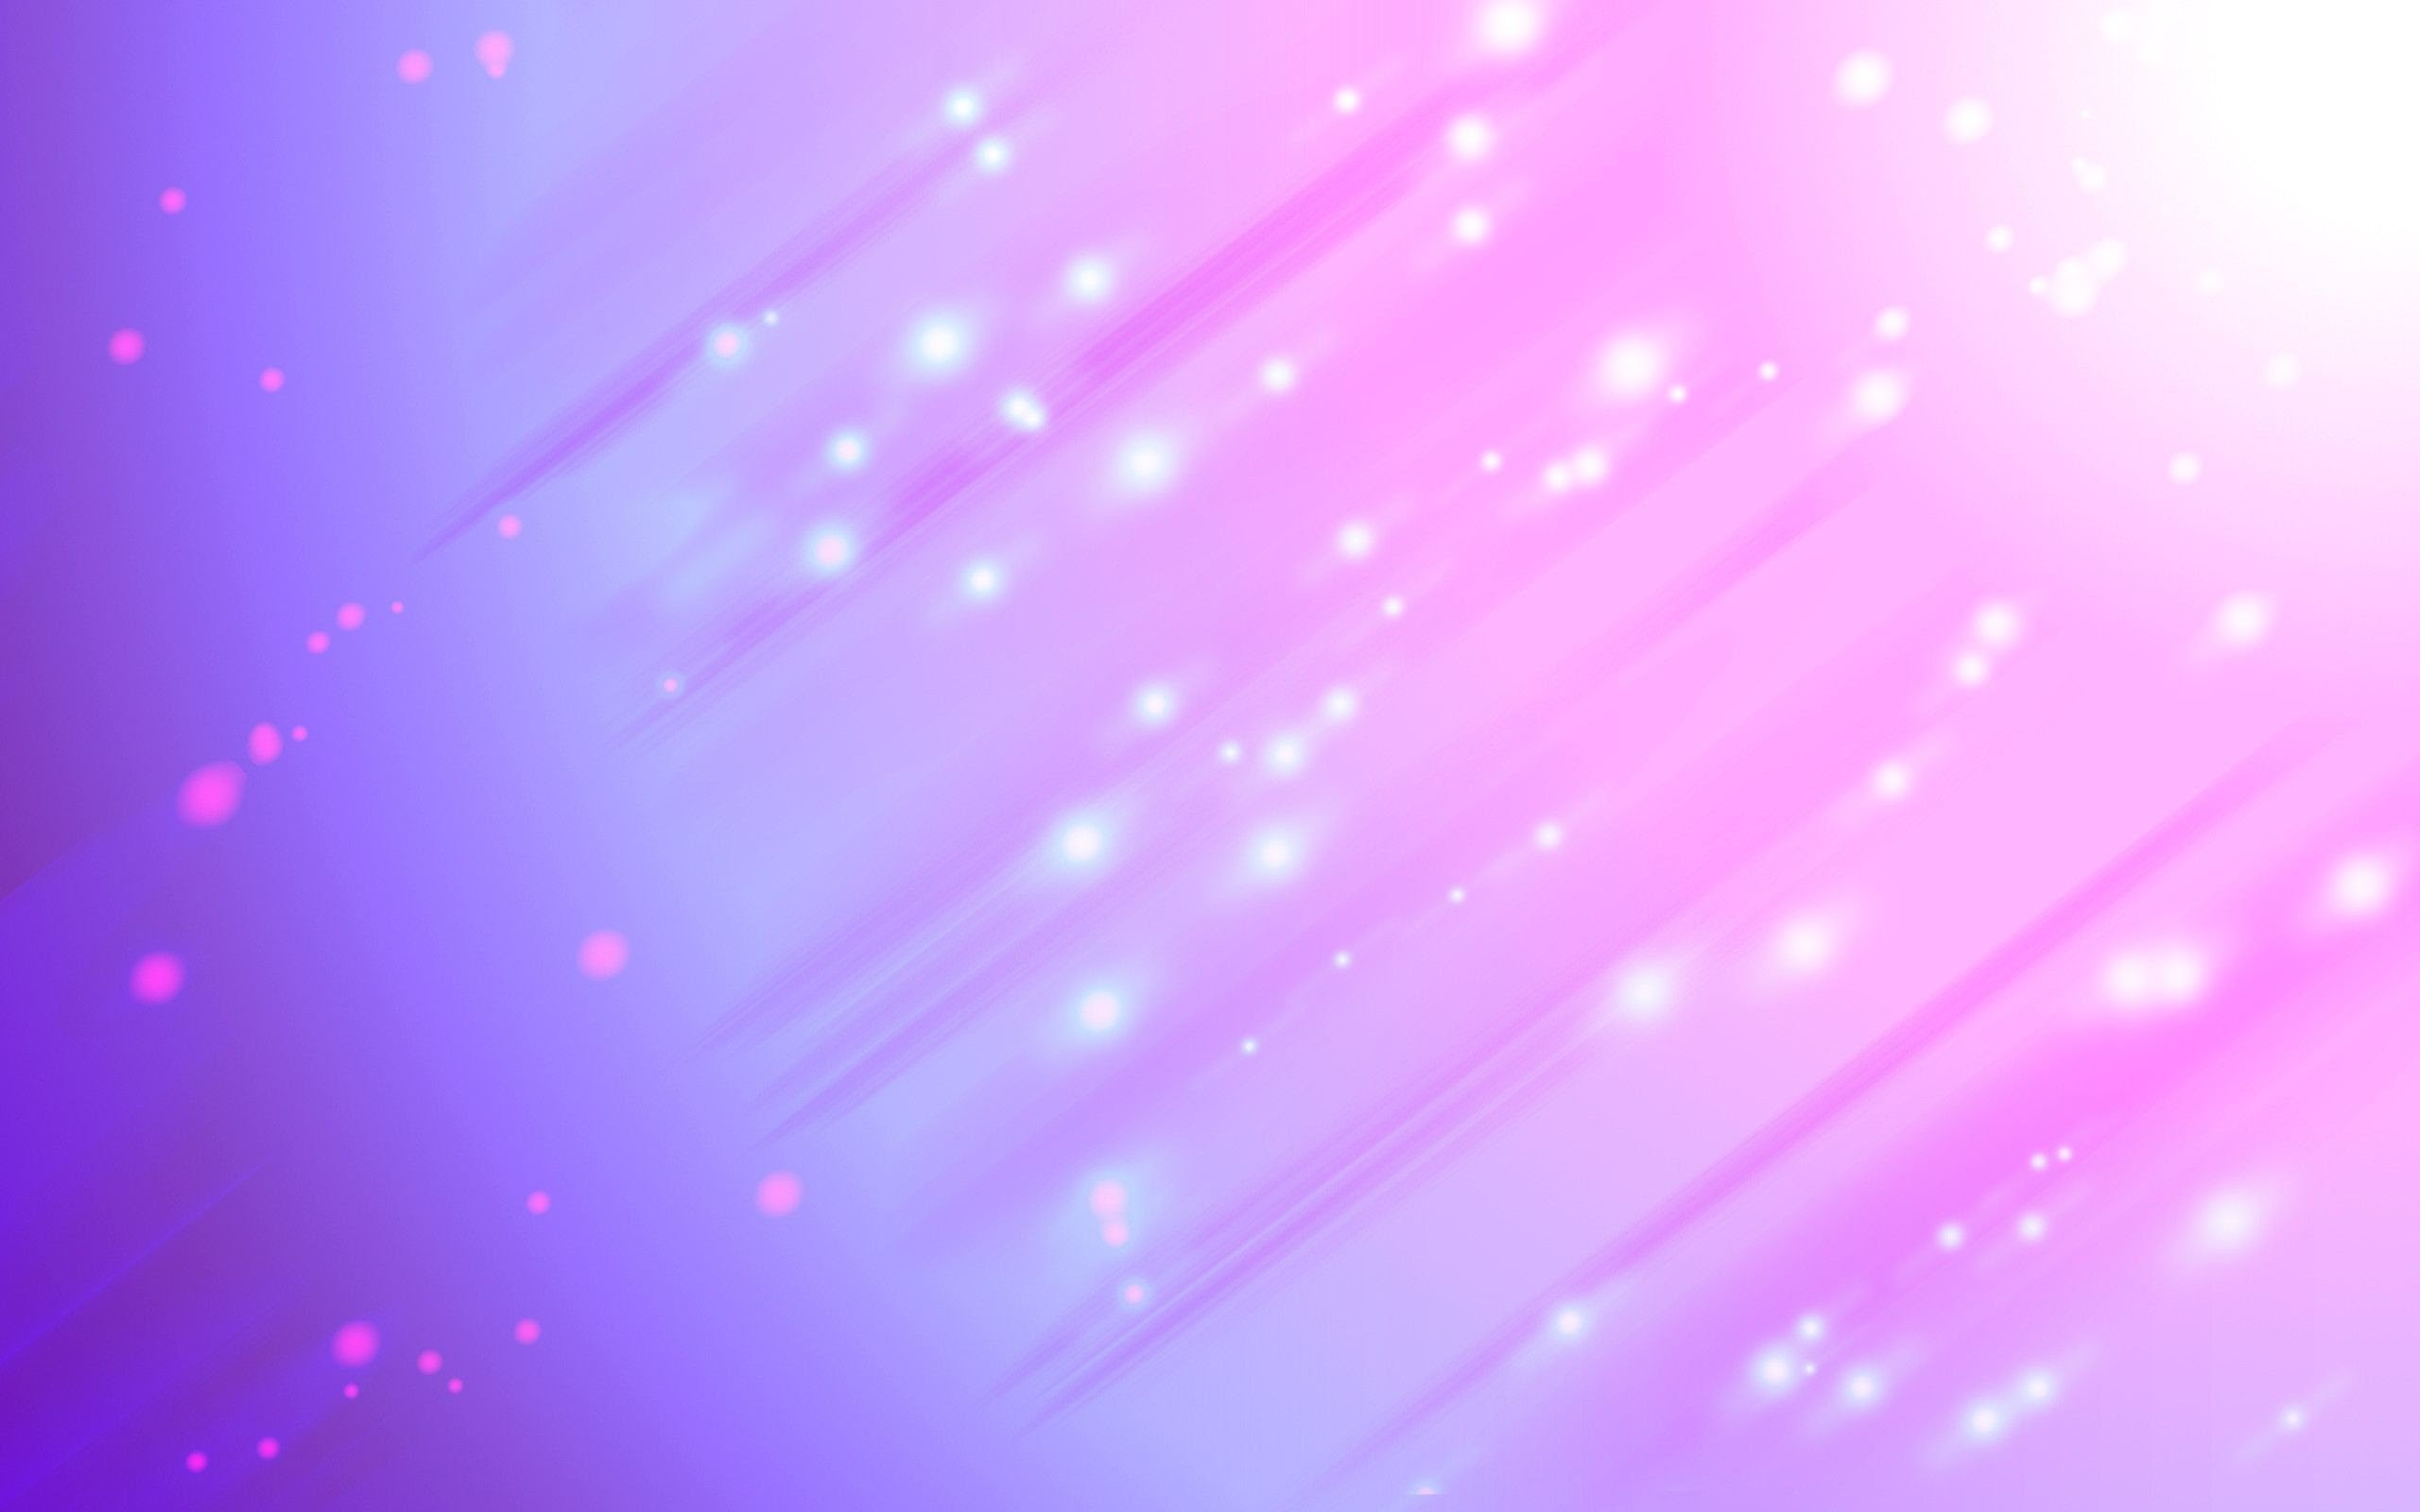 Unduh 8300 Background Image Tumblr Gratis Terbaru